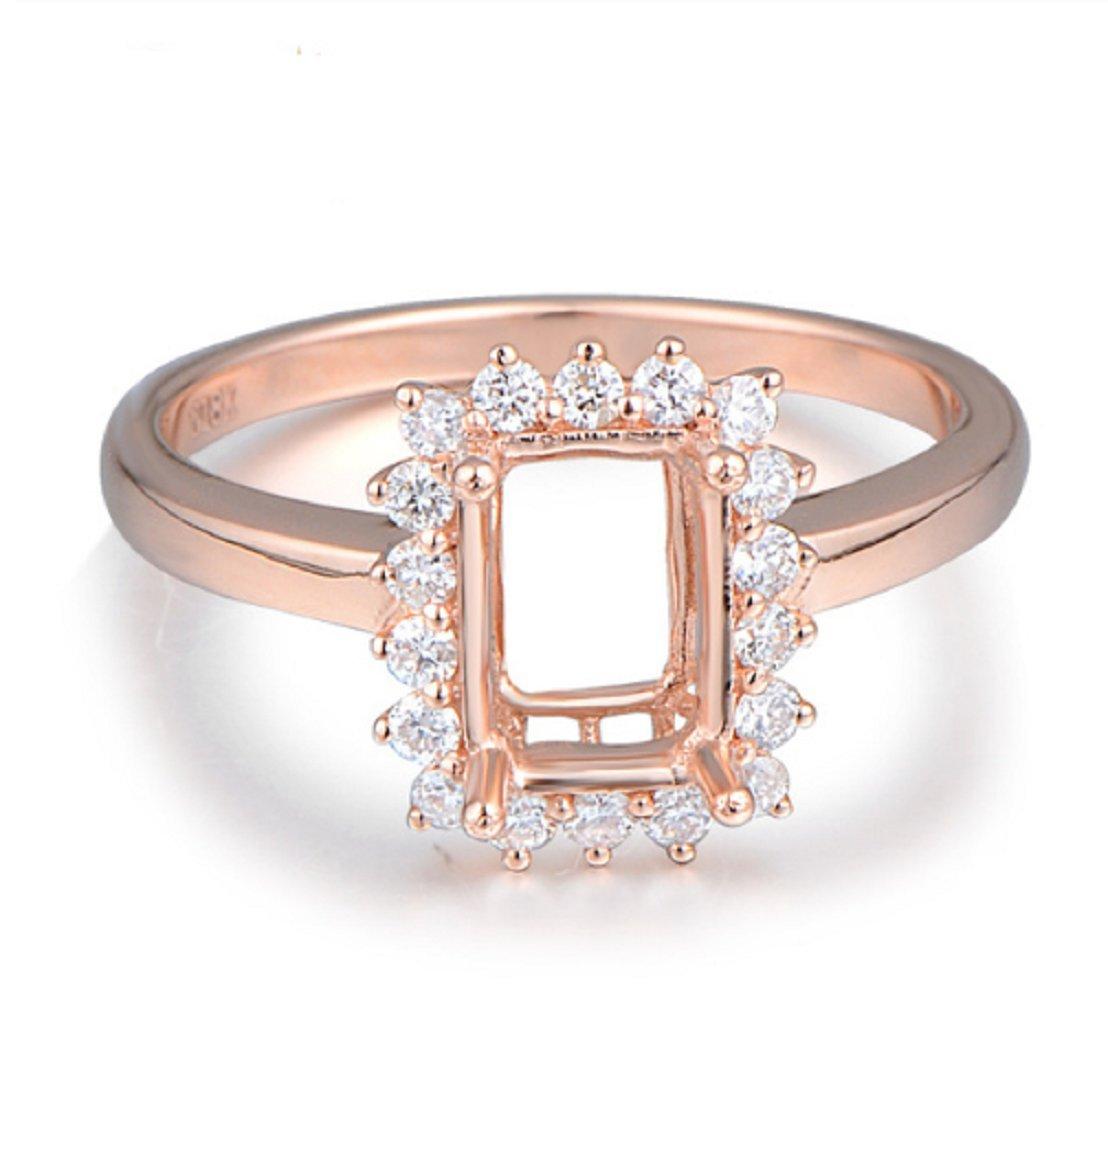 GOWE 5x7mm Emerald Cut 18k Rose Gold Diamond Semi Mount Ring Fine Jewelry by GOWE